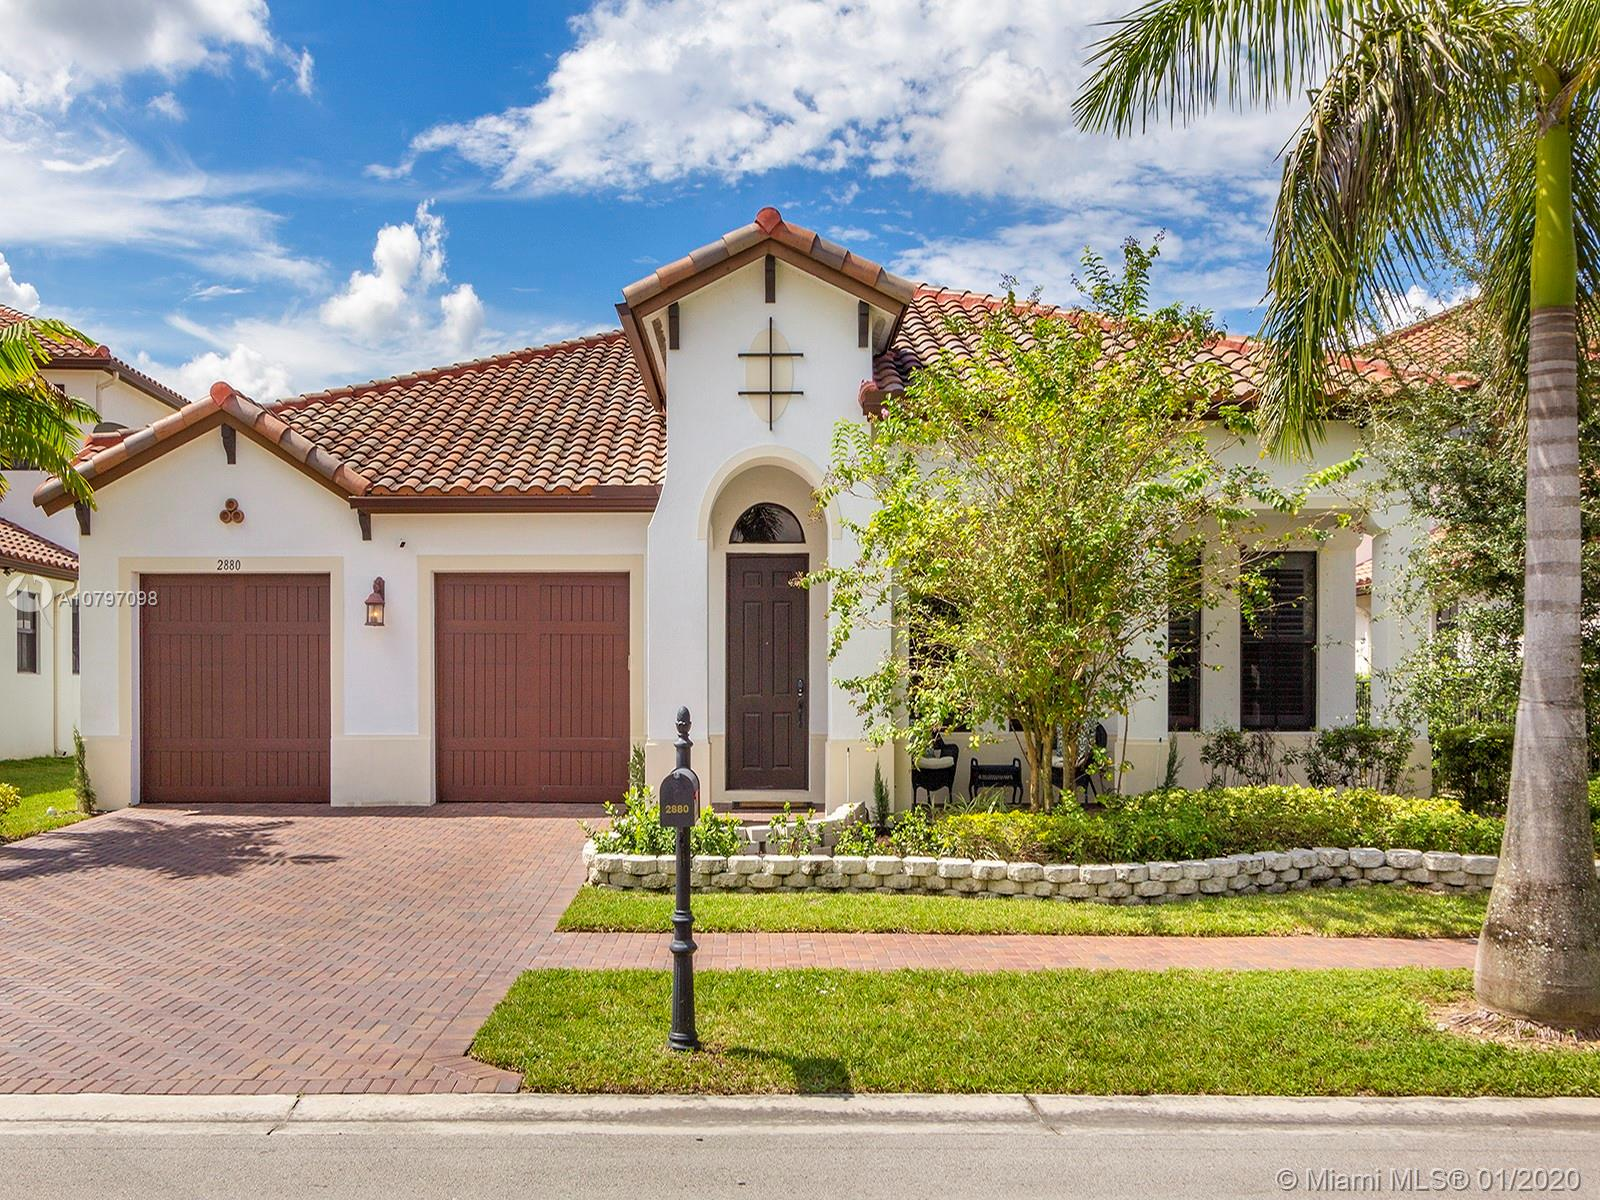 2880 NW 82nd Way - Pembroke Pines, Florida